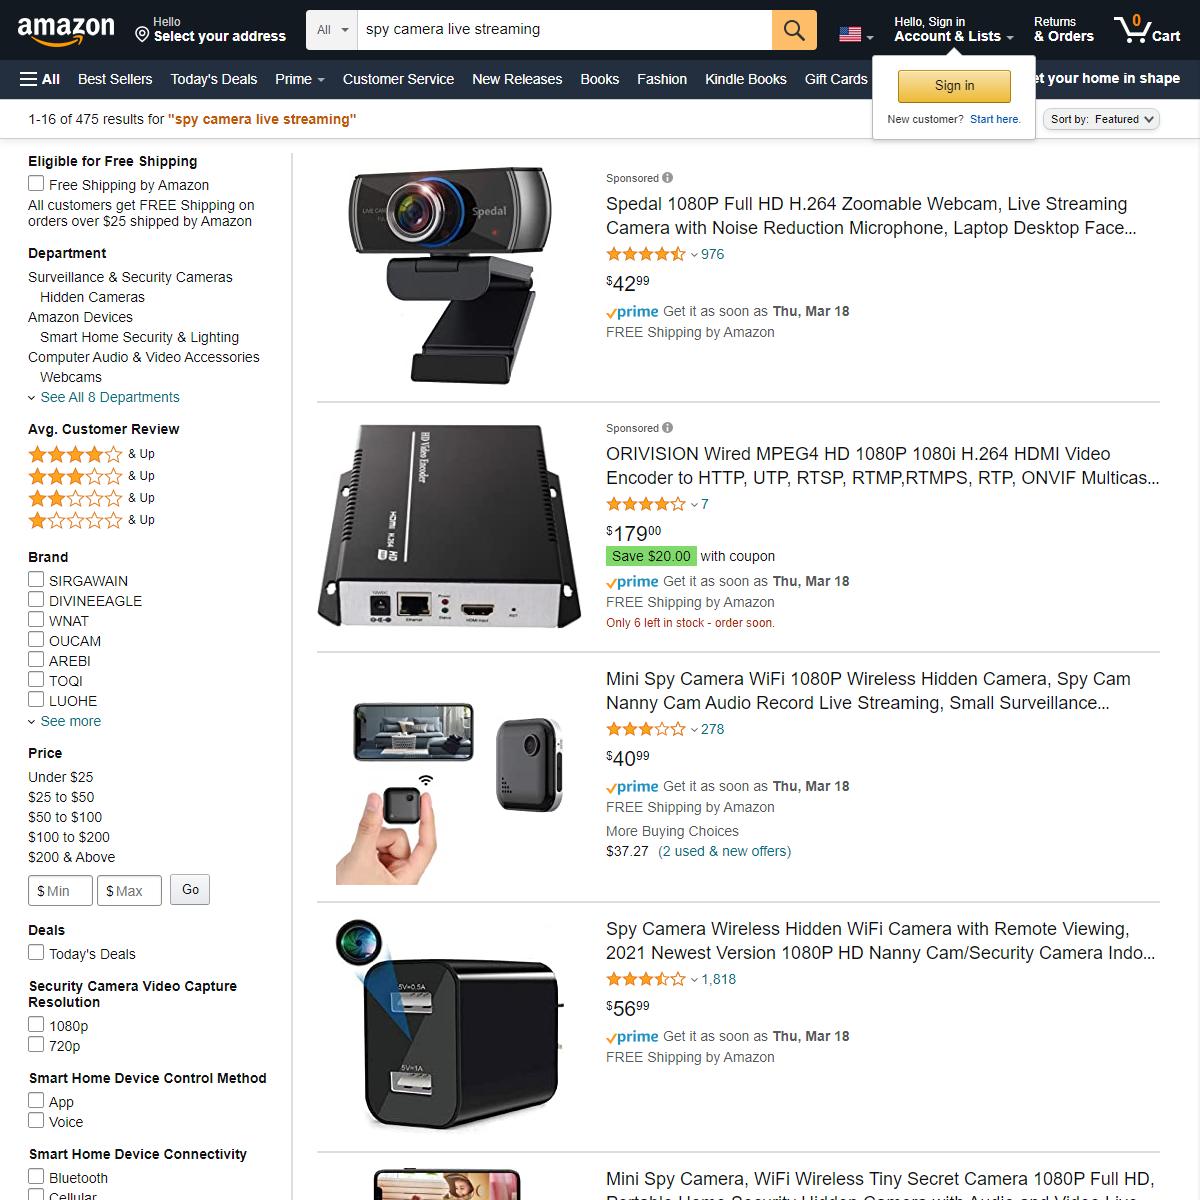 Amazon.com - spy camera live streaming